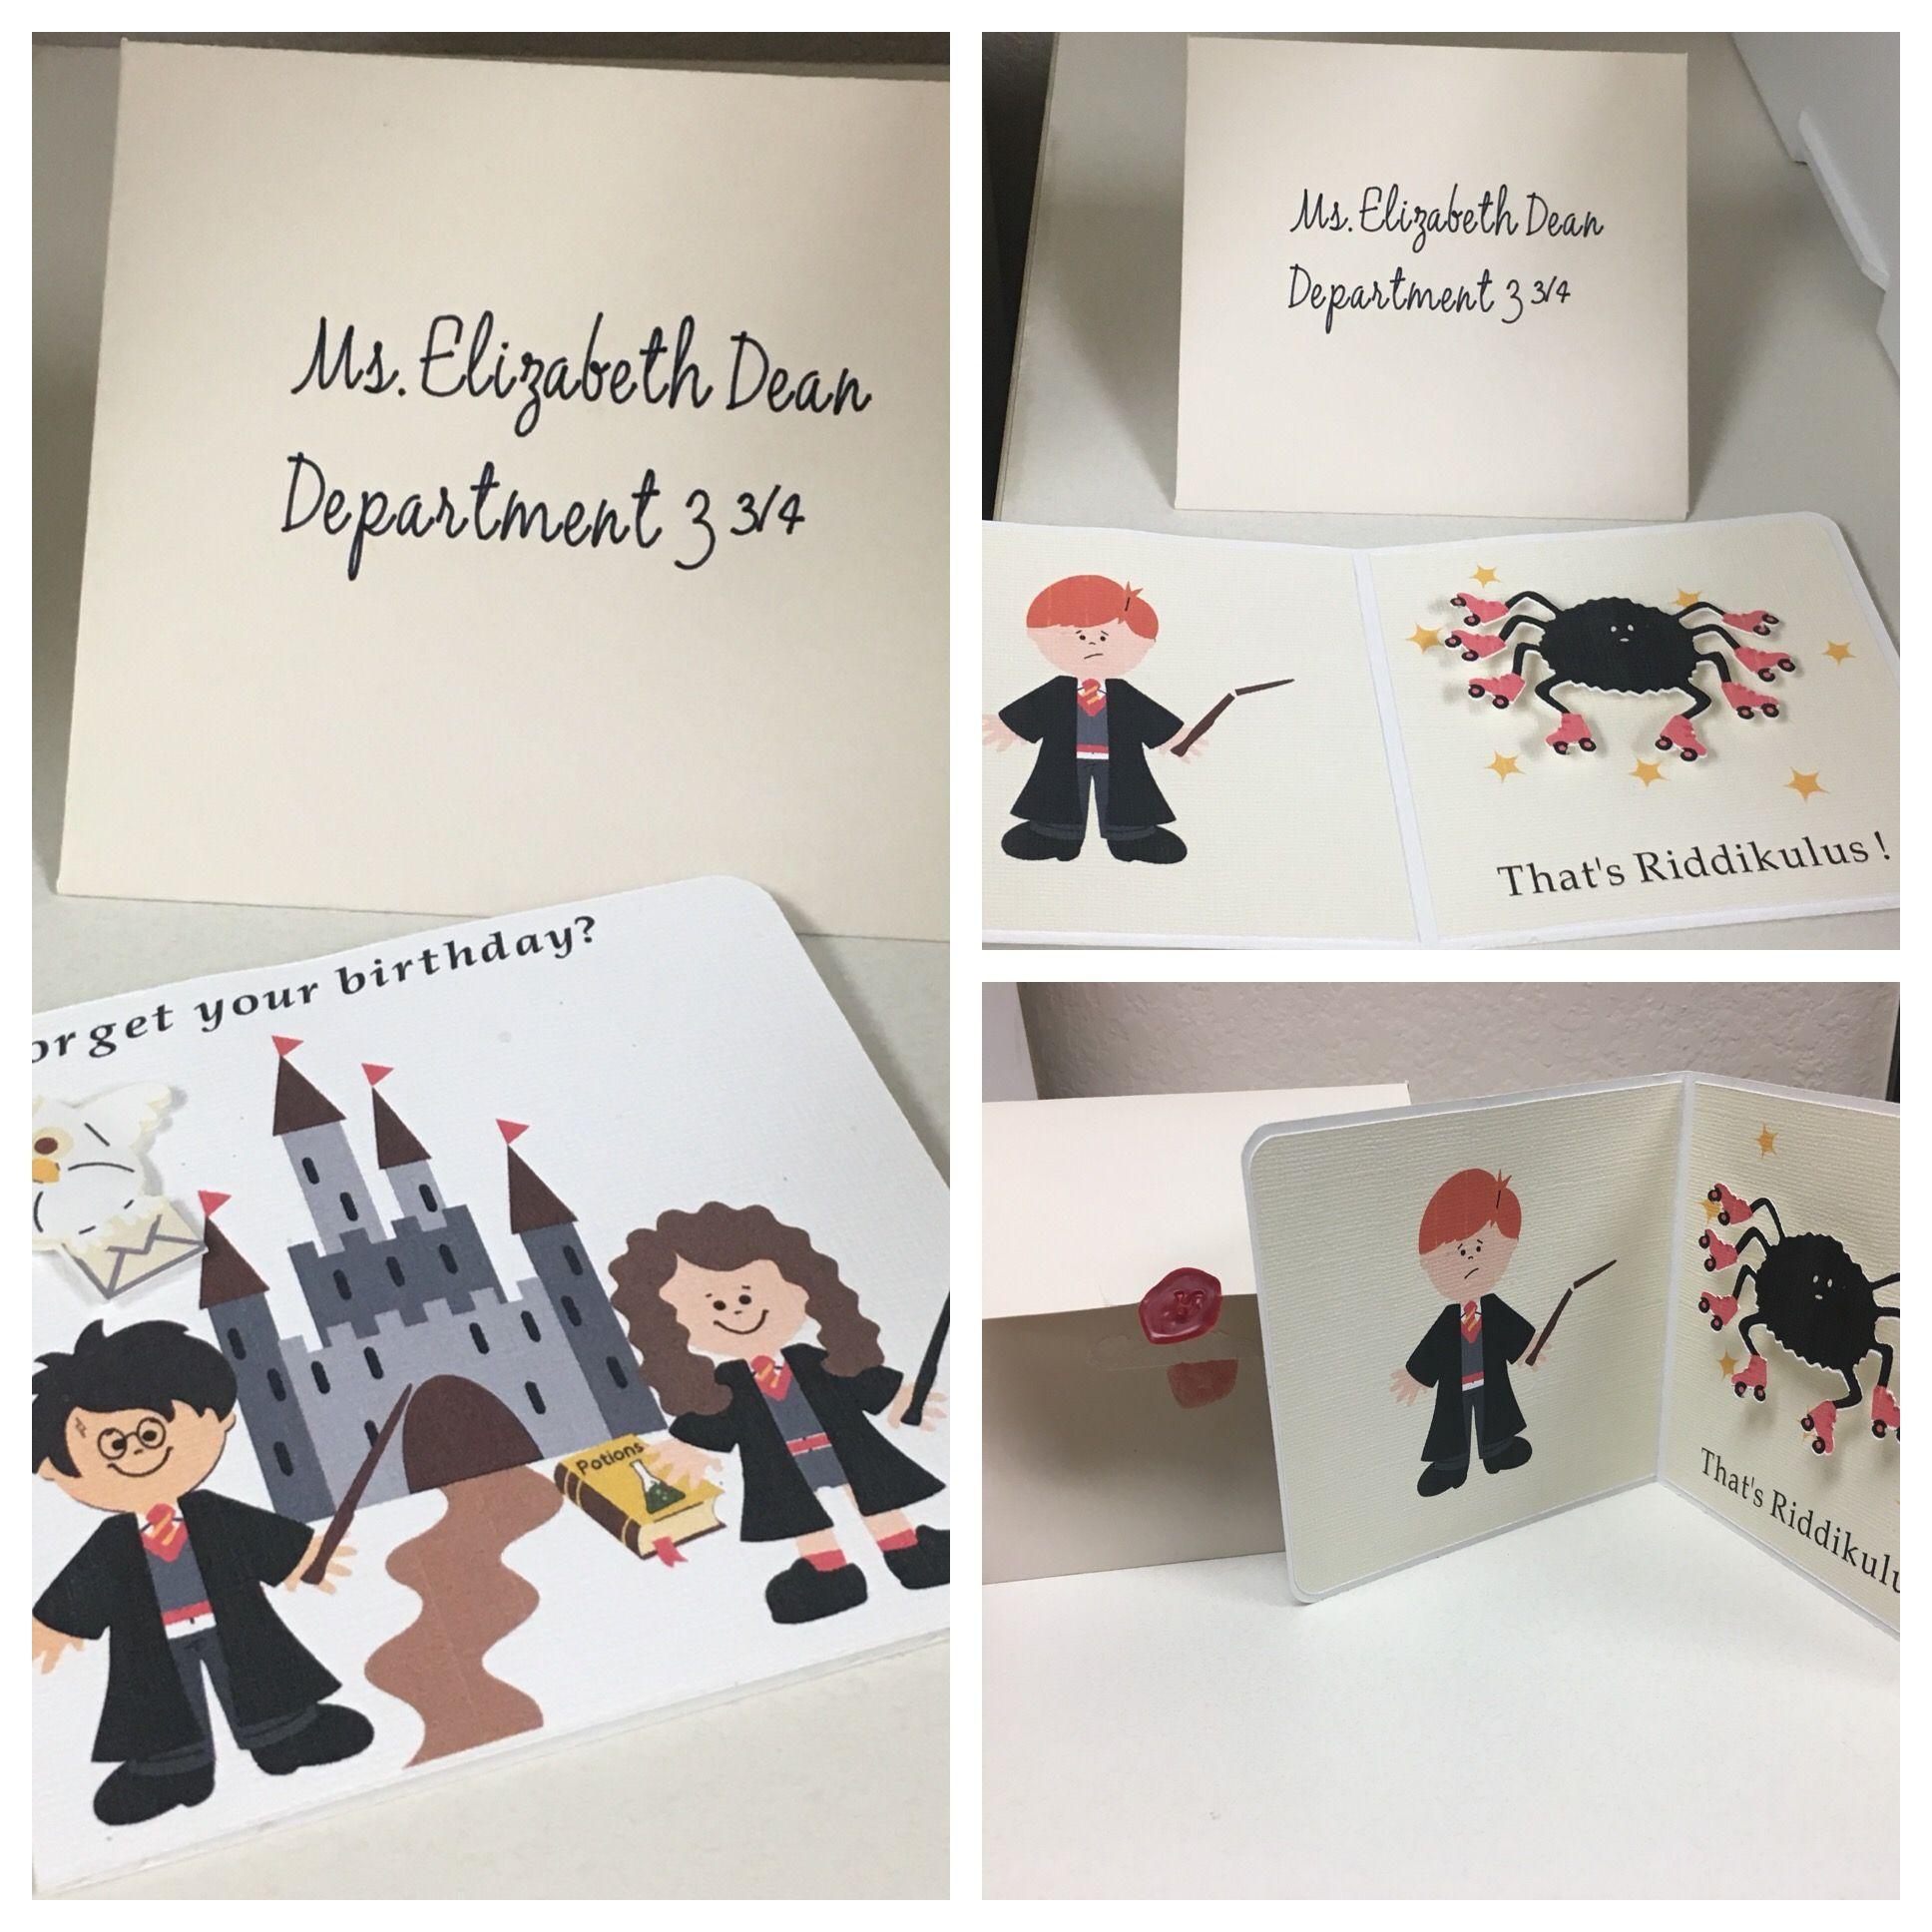 Harry Potter Birthday Card Diy Harry Potter Birthday Cards Birthday Cards Diy Harry Potter Birthday